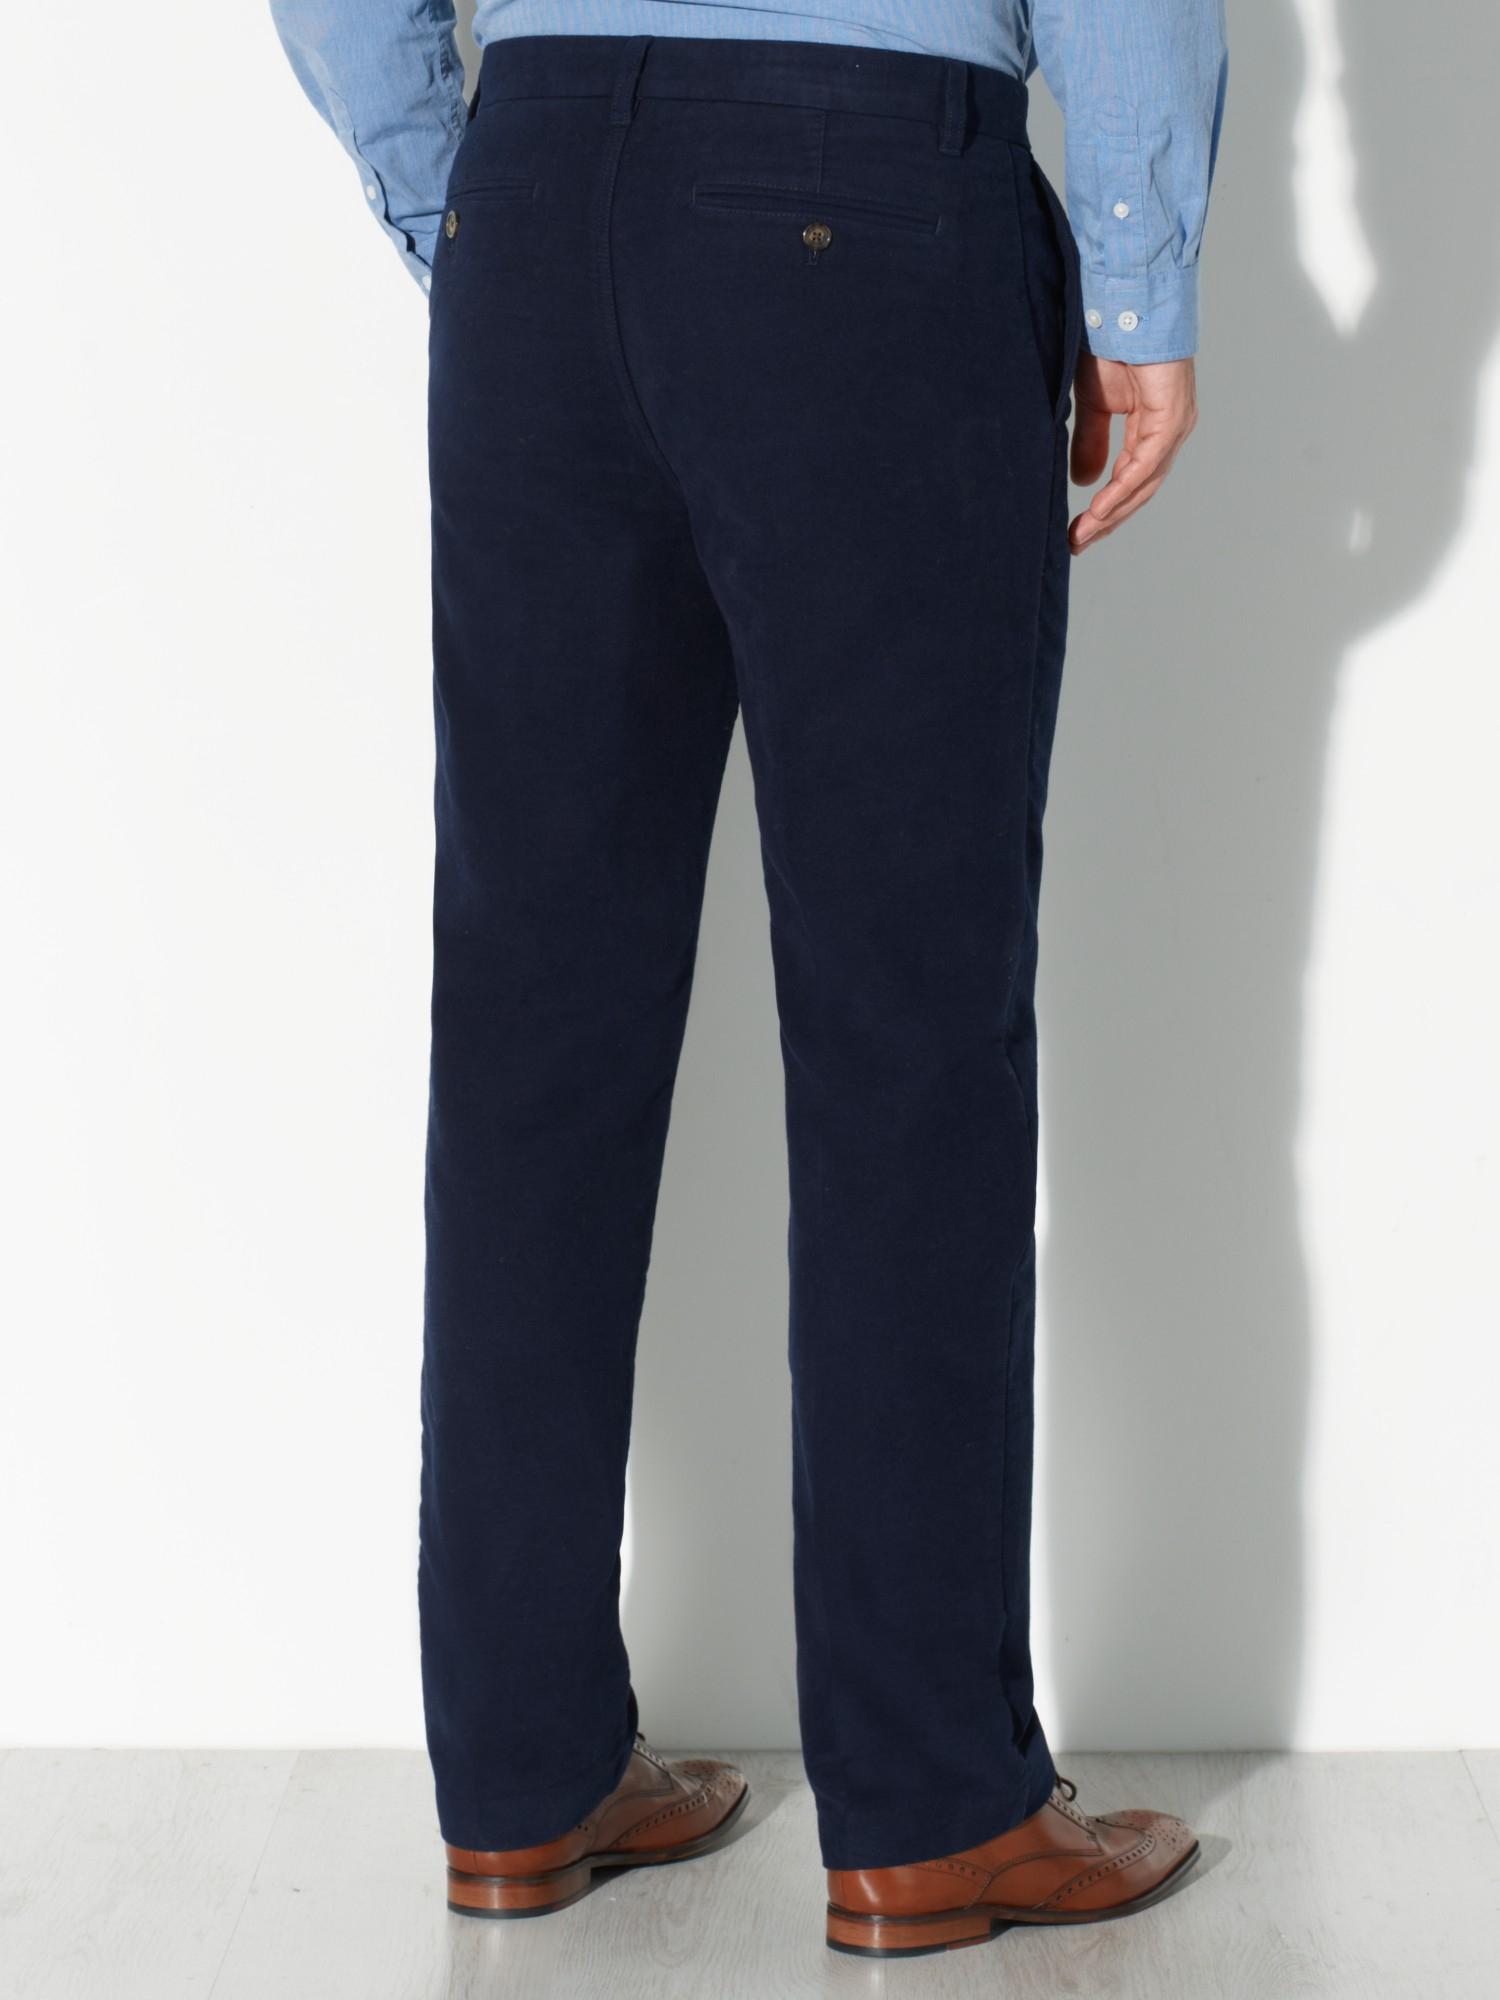 John Lewis Cotton Moleskin Trousers in Navy (Blue) for Men